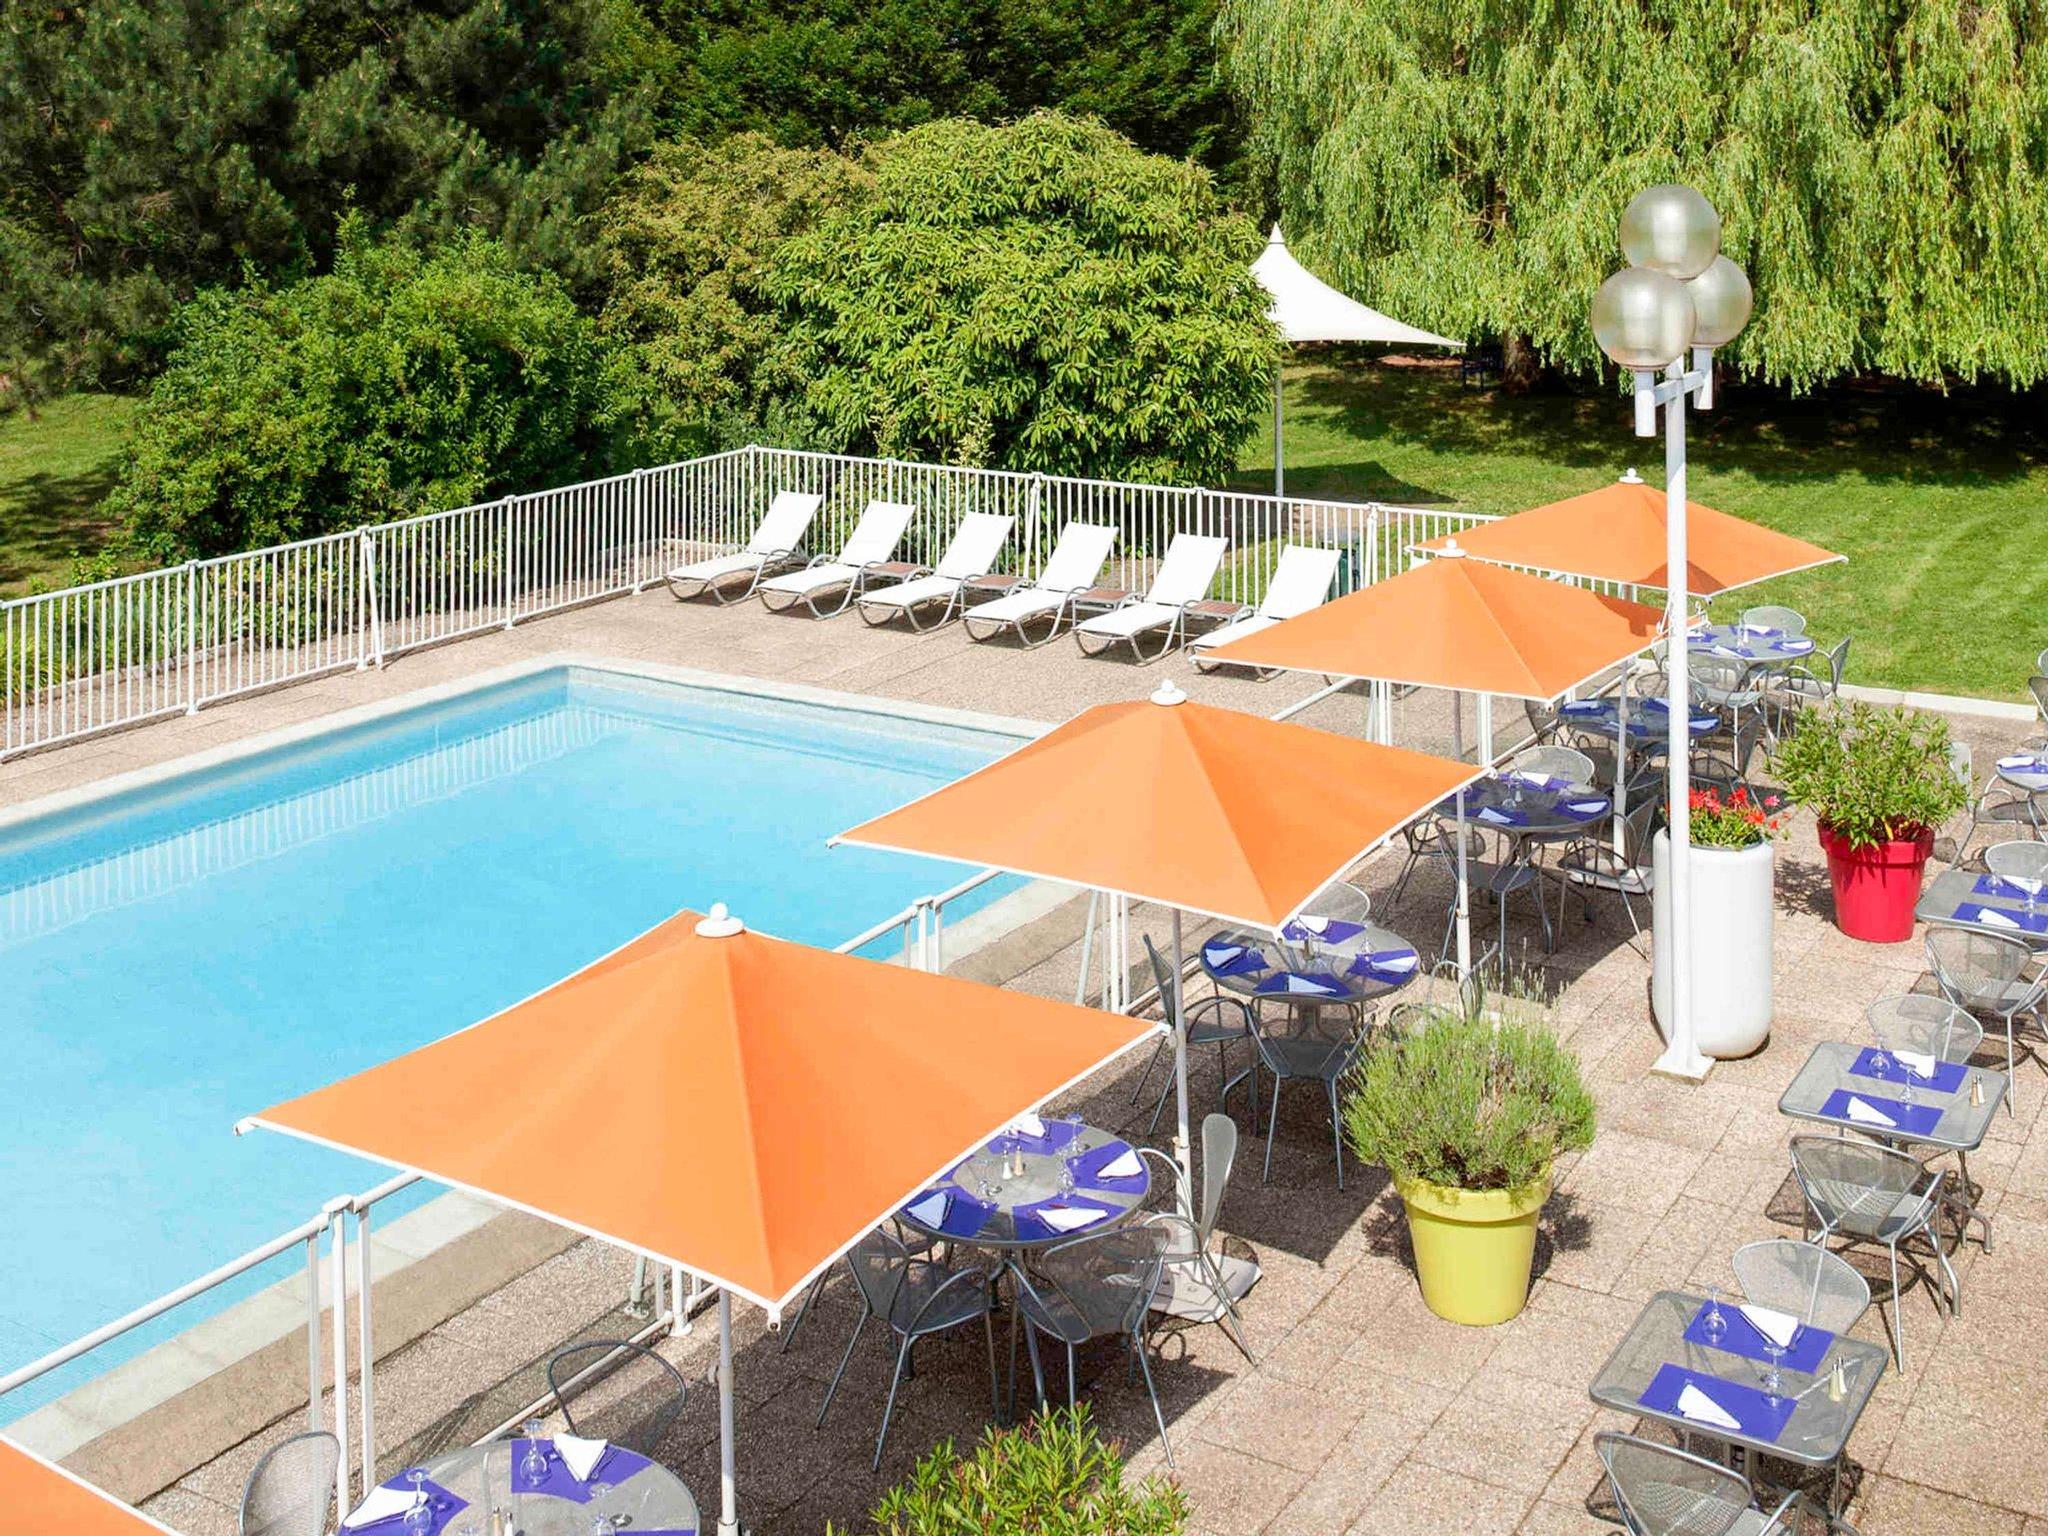 Novotel Metz Hauconcourt Hotel